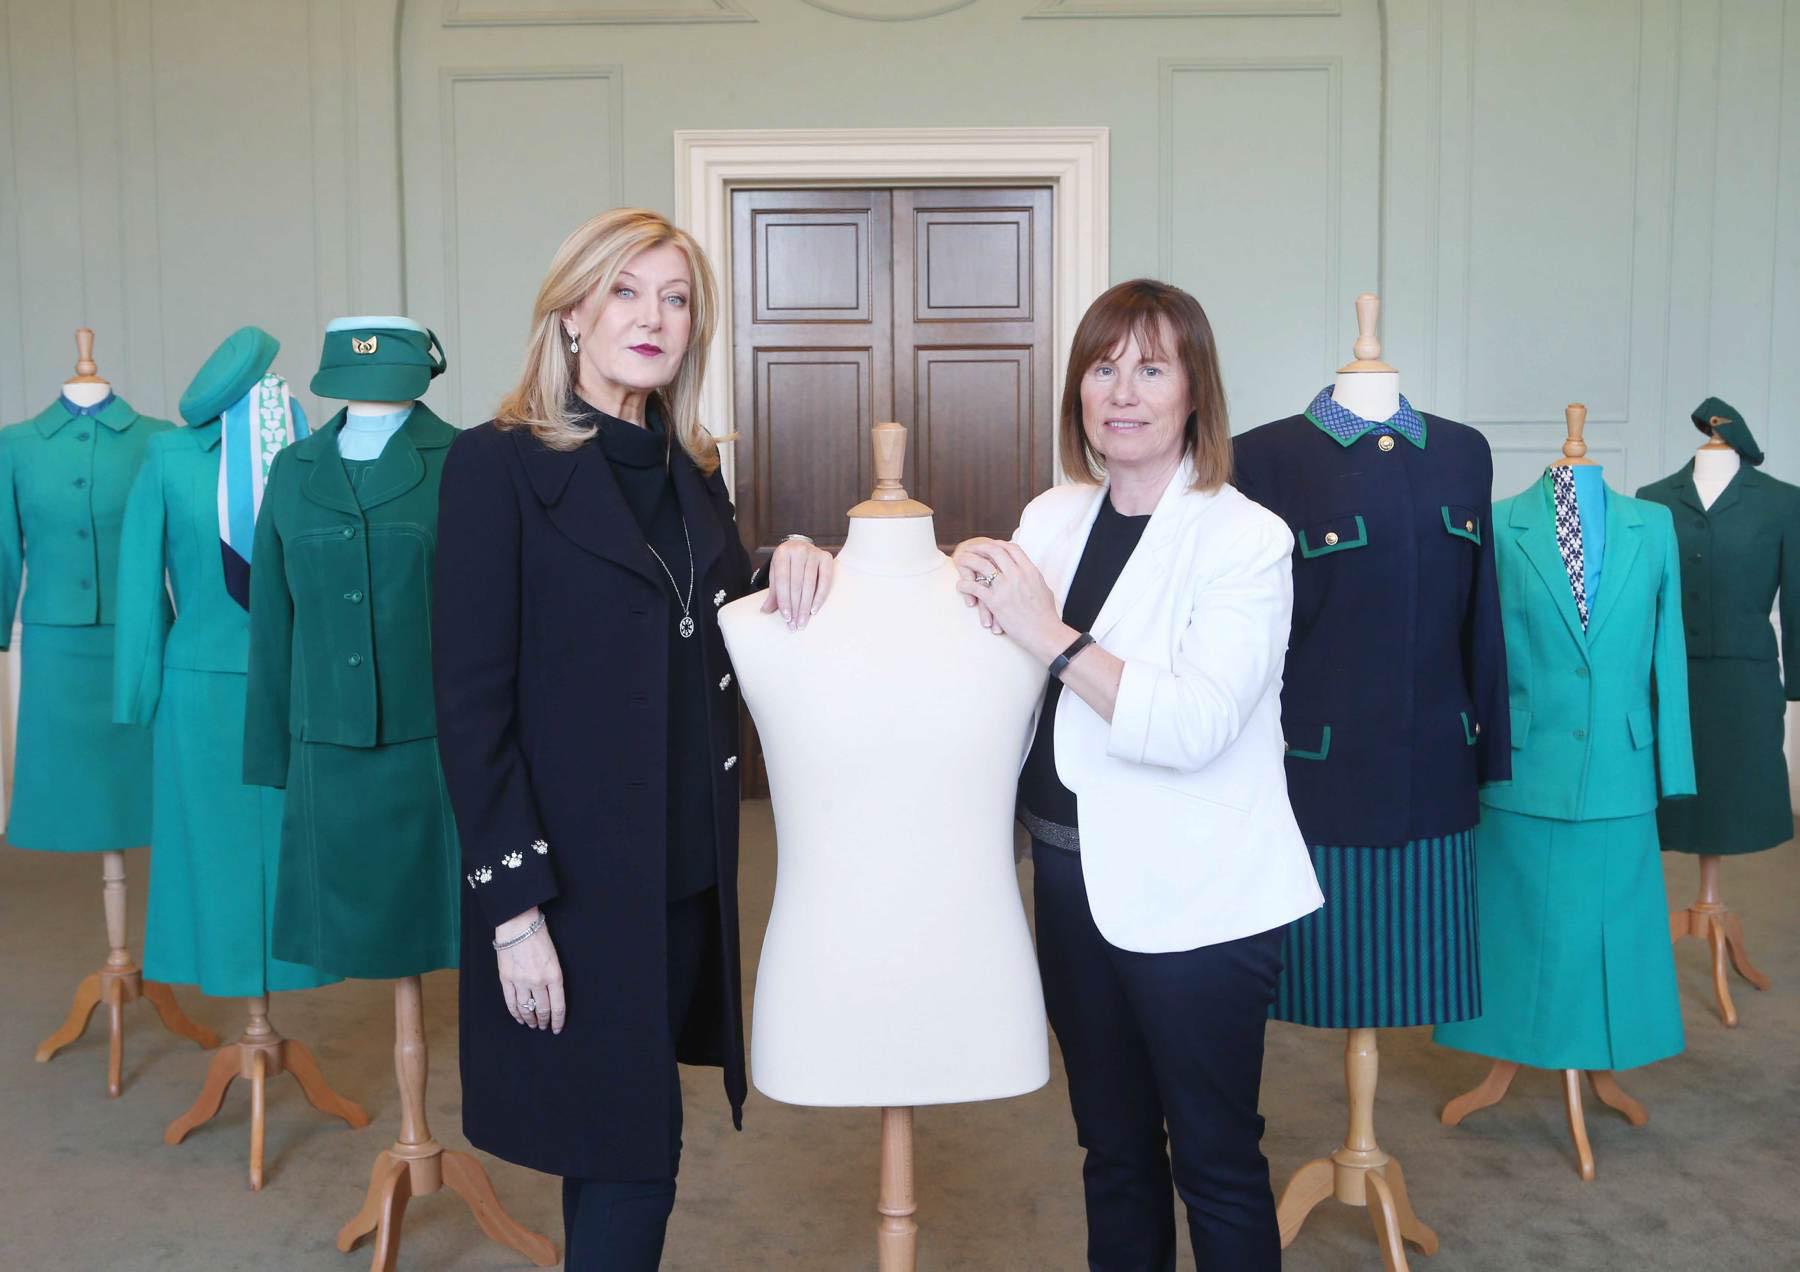 Runway fashion: Irish designer Louise Kennedy returns to design new Aer Lingus uniforms